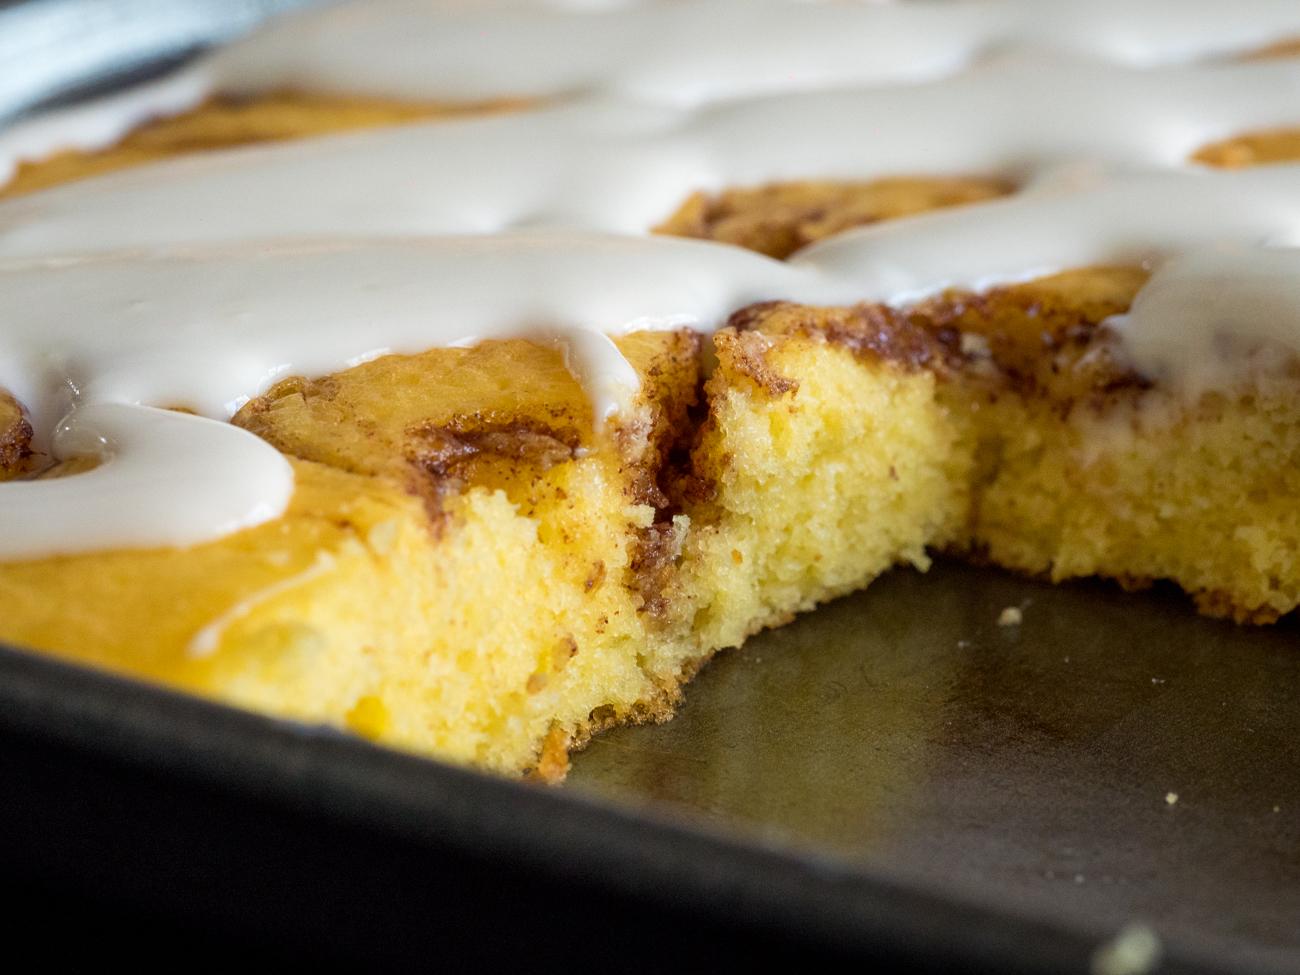 Cinnamon-Roll-Sheet-Cake-Horizontal-5